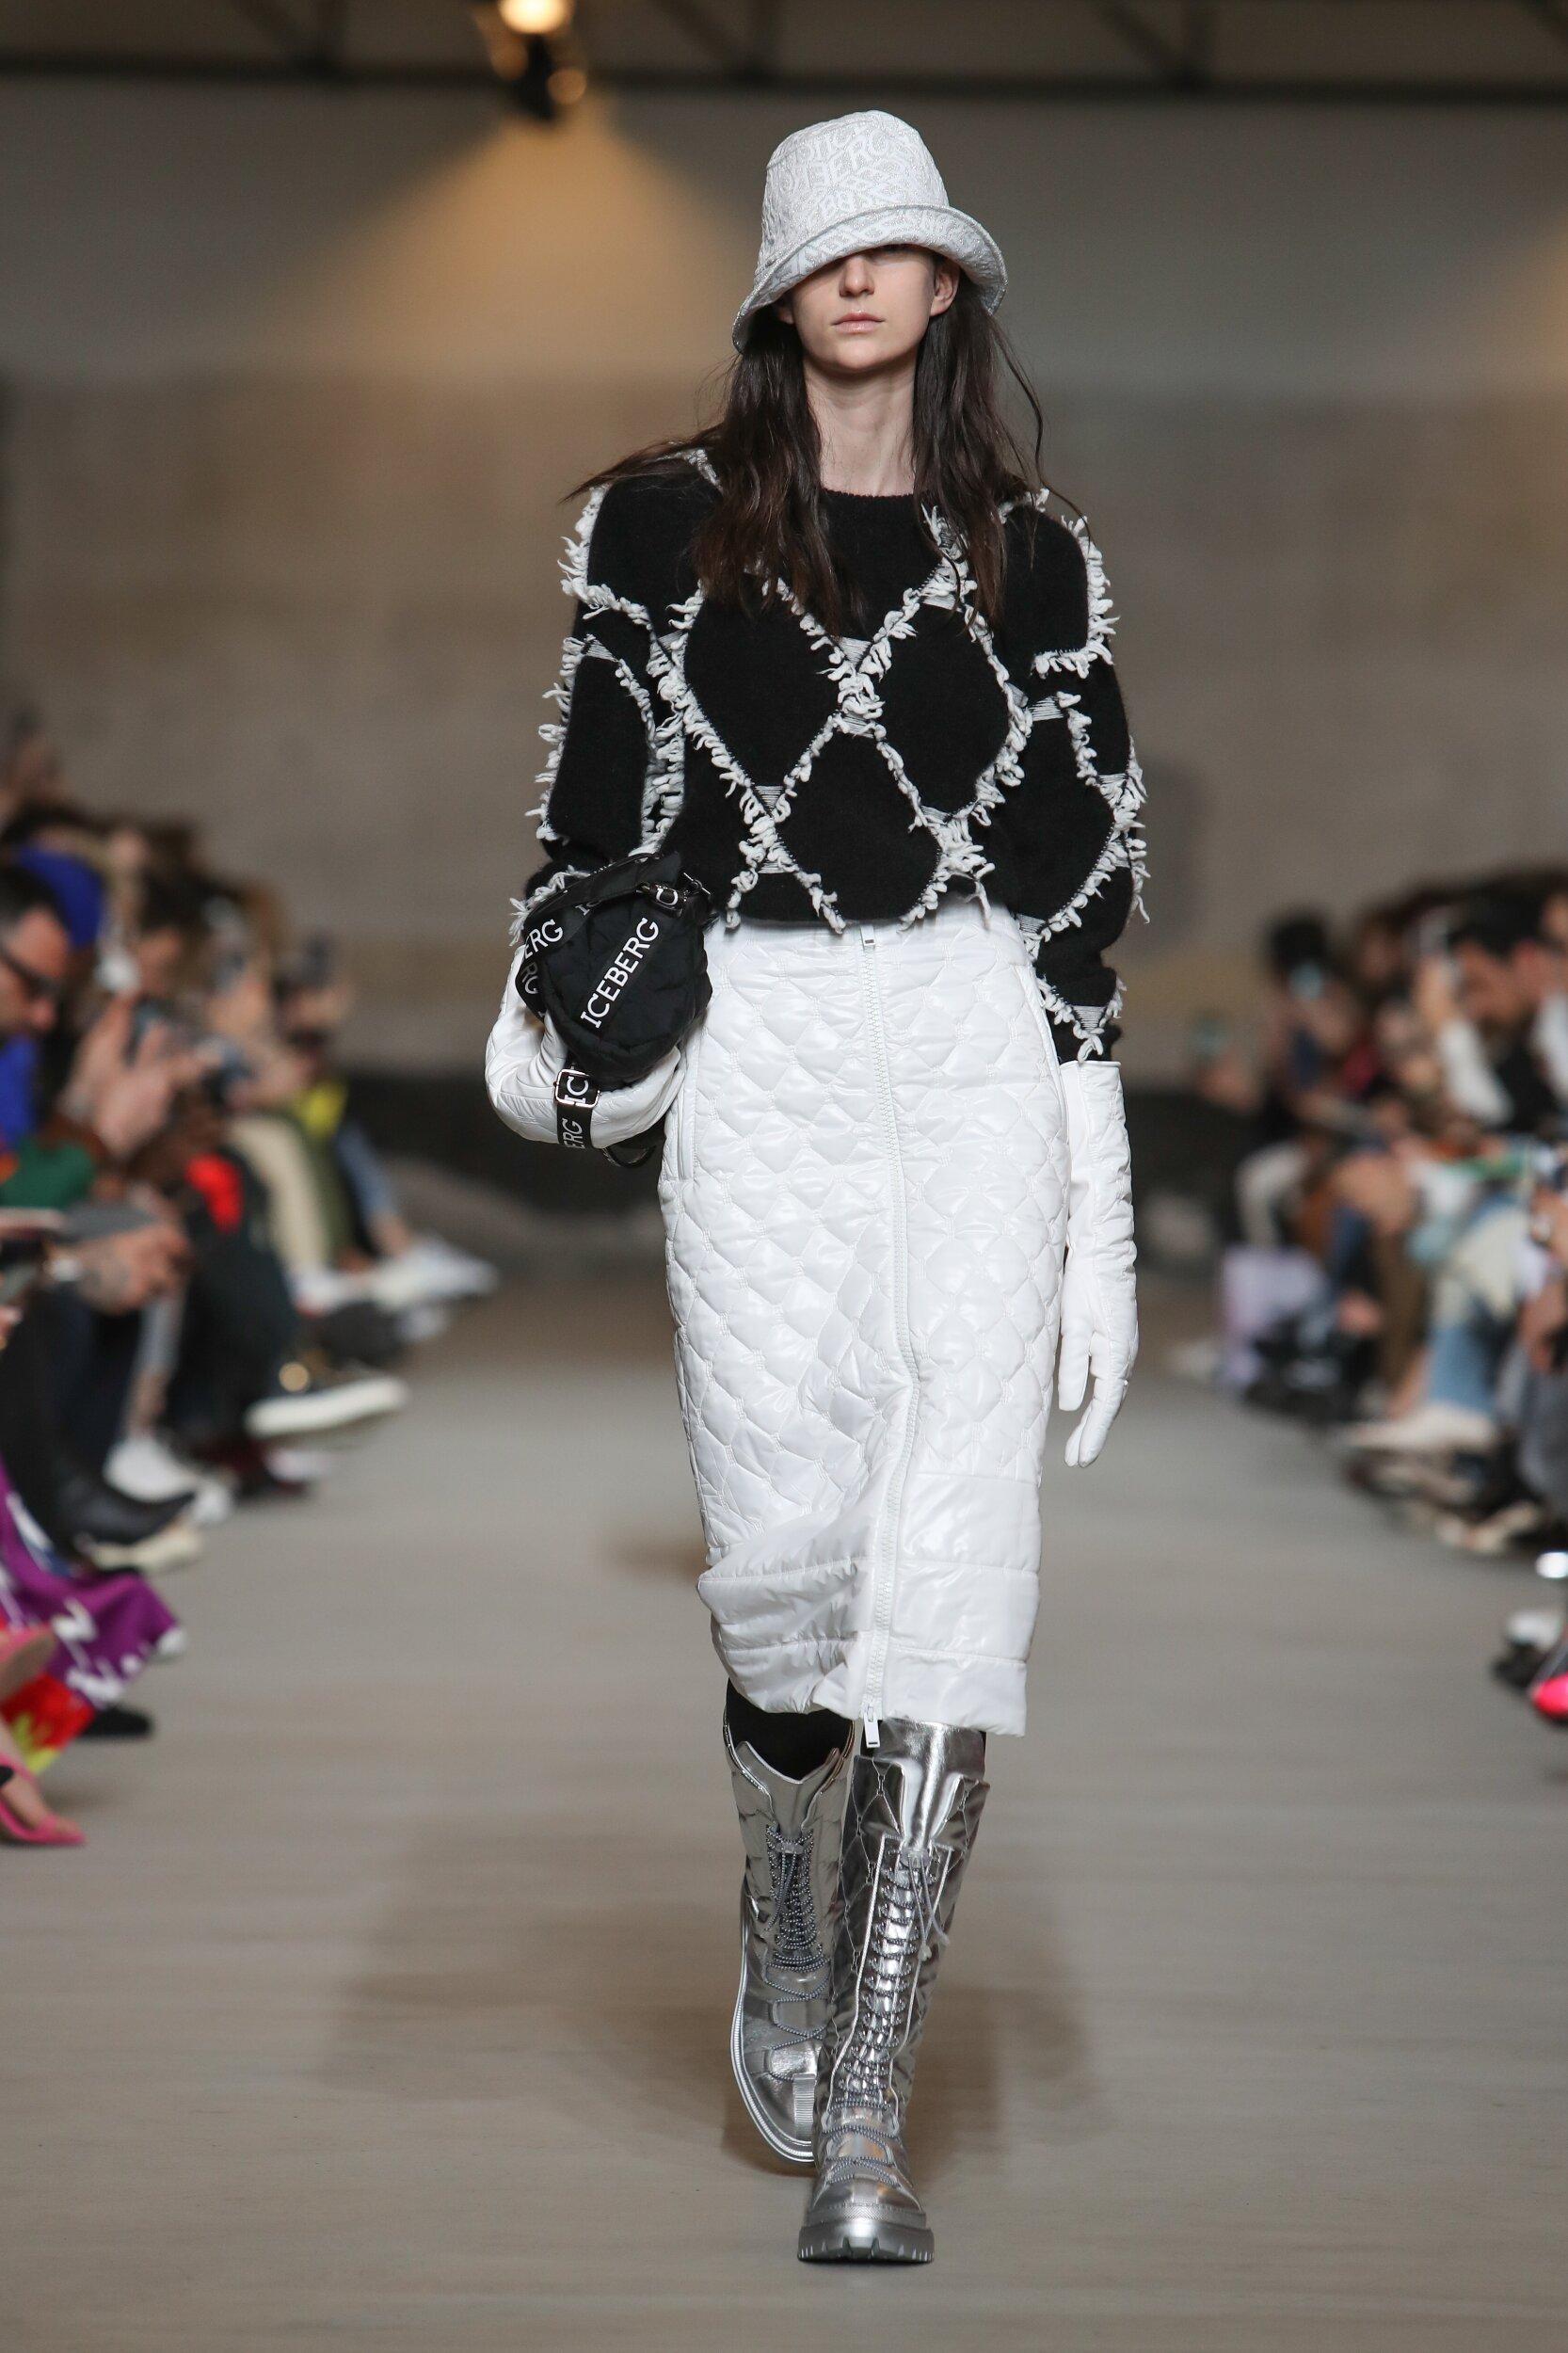 FW 2020-21 Fashion Show Iceberg